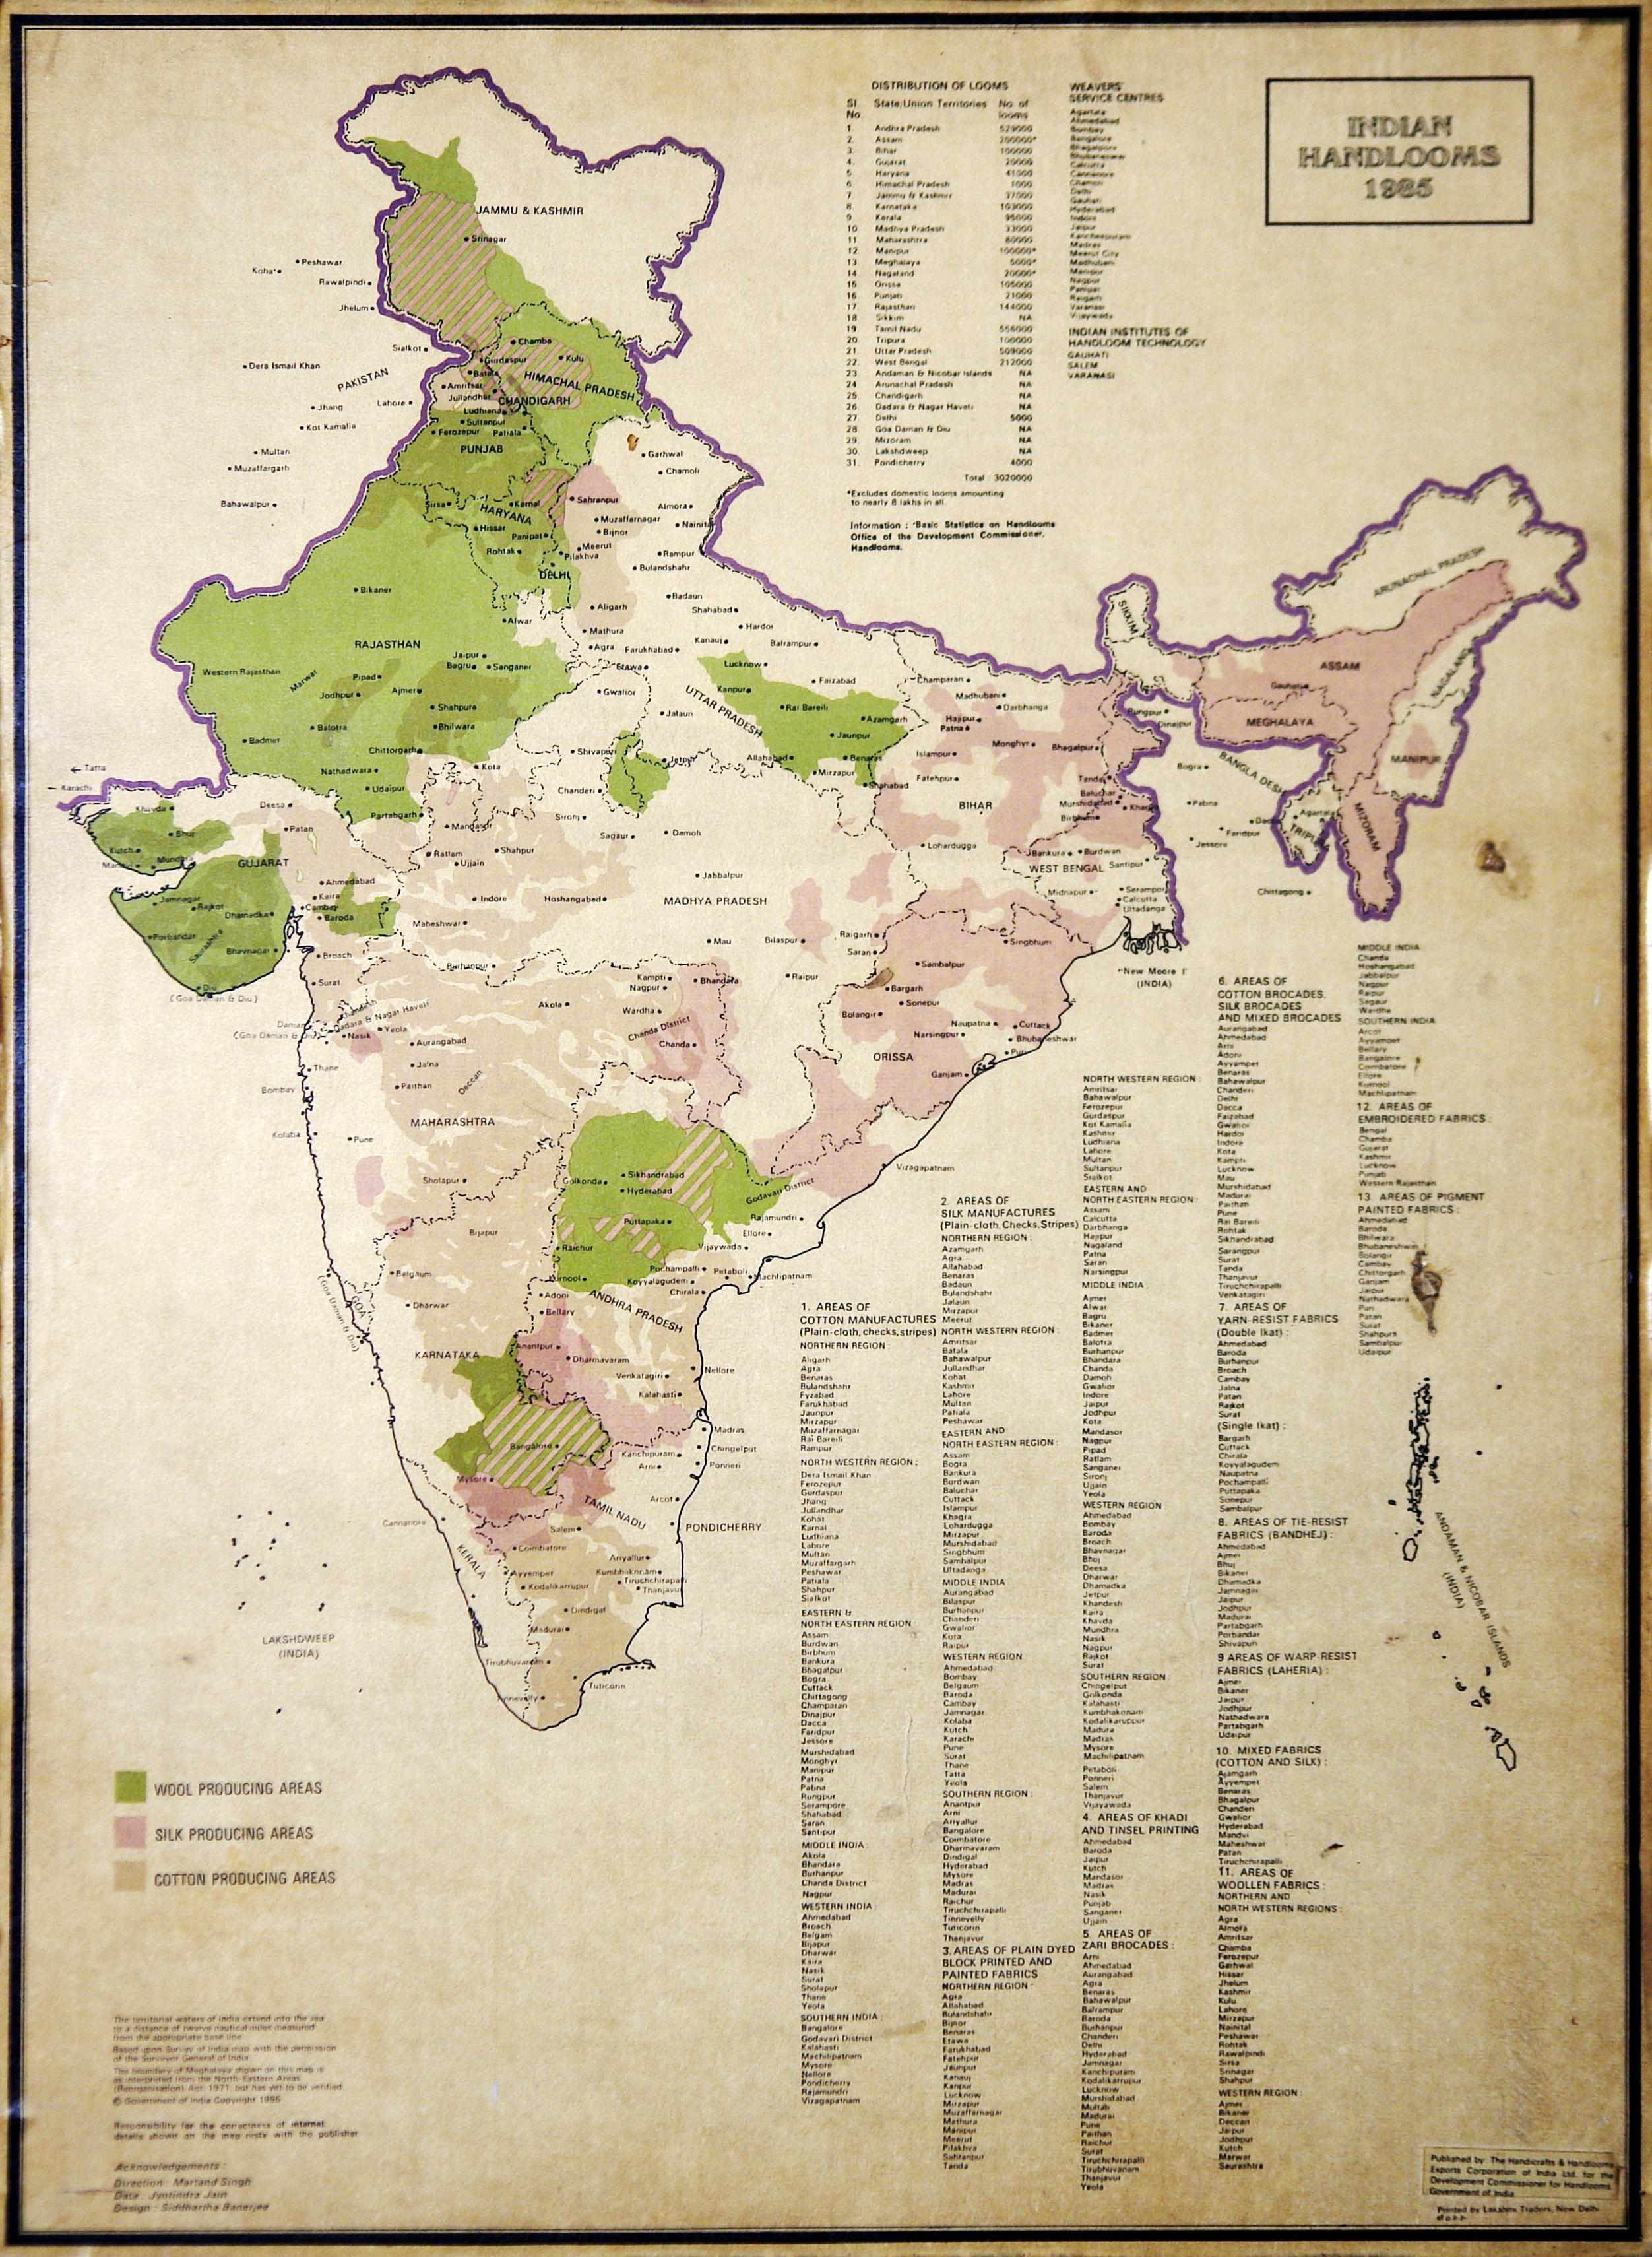 Baroda India Map.File Map Of Indian Handlooms 1985 Crafts Museum New Delhi India